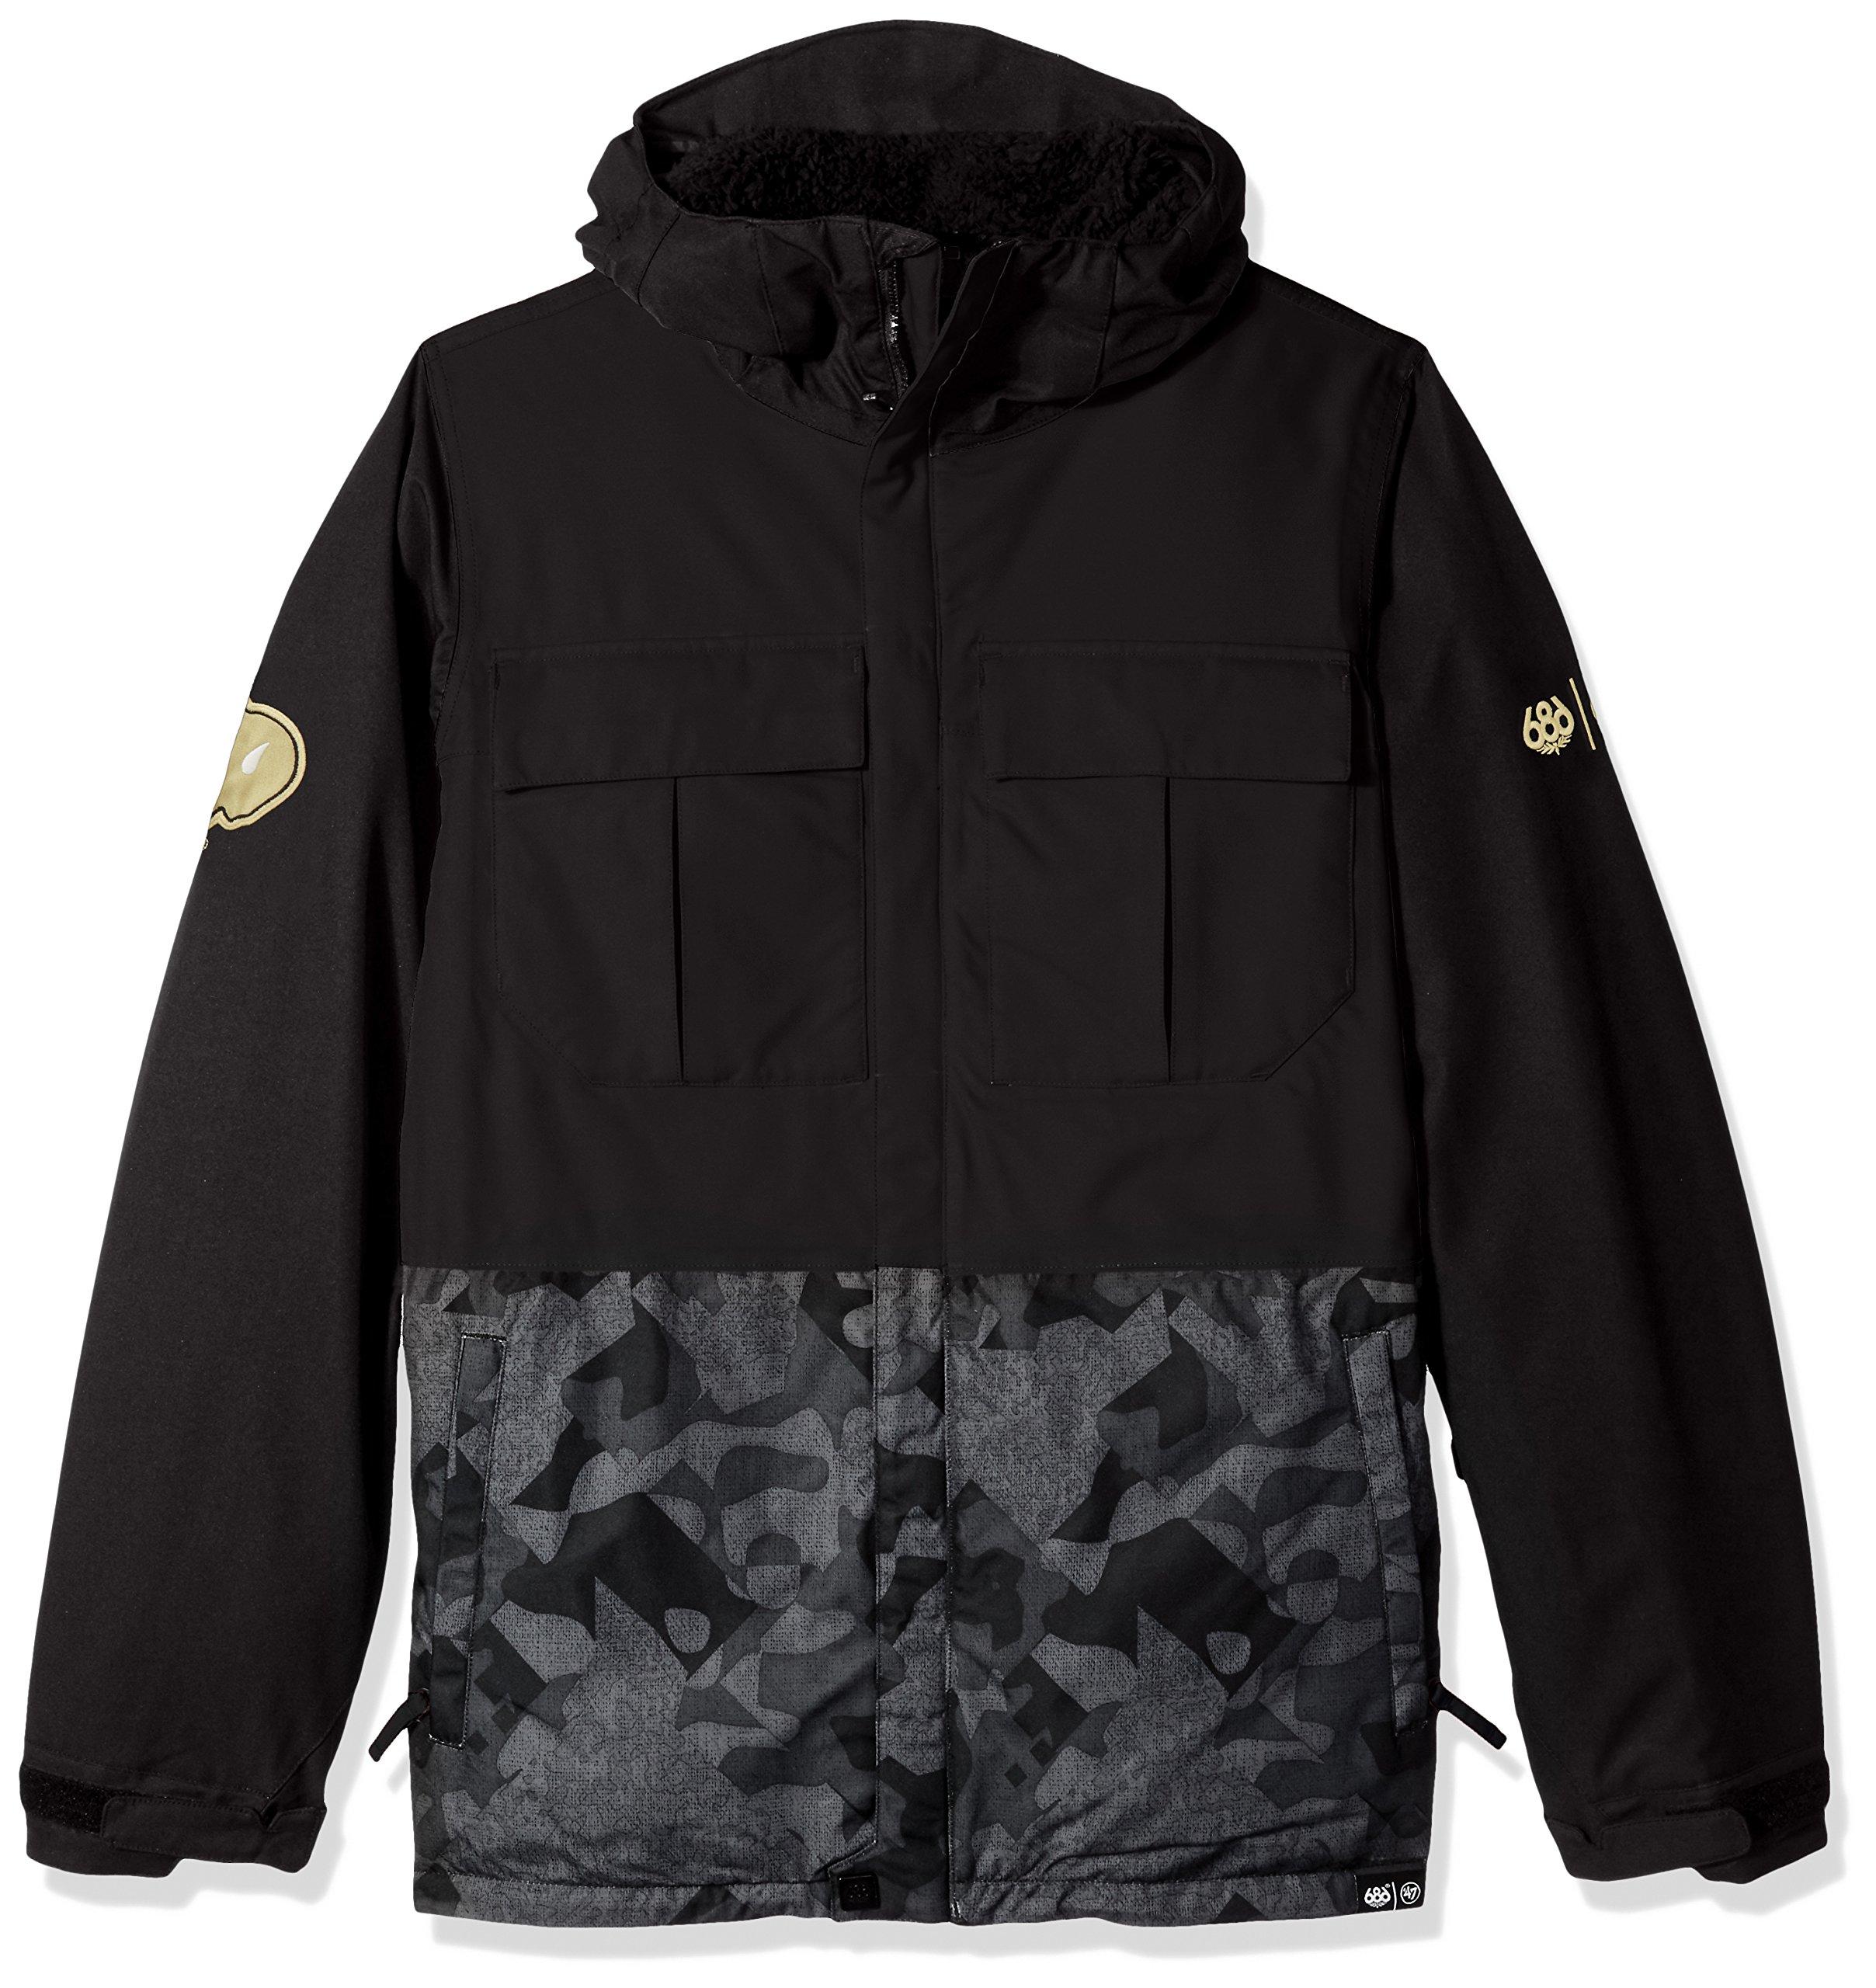 686x47 NCAA Colorado Buffaloes Men's Victory Insulated Jacket, X-Small, Colorado Black